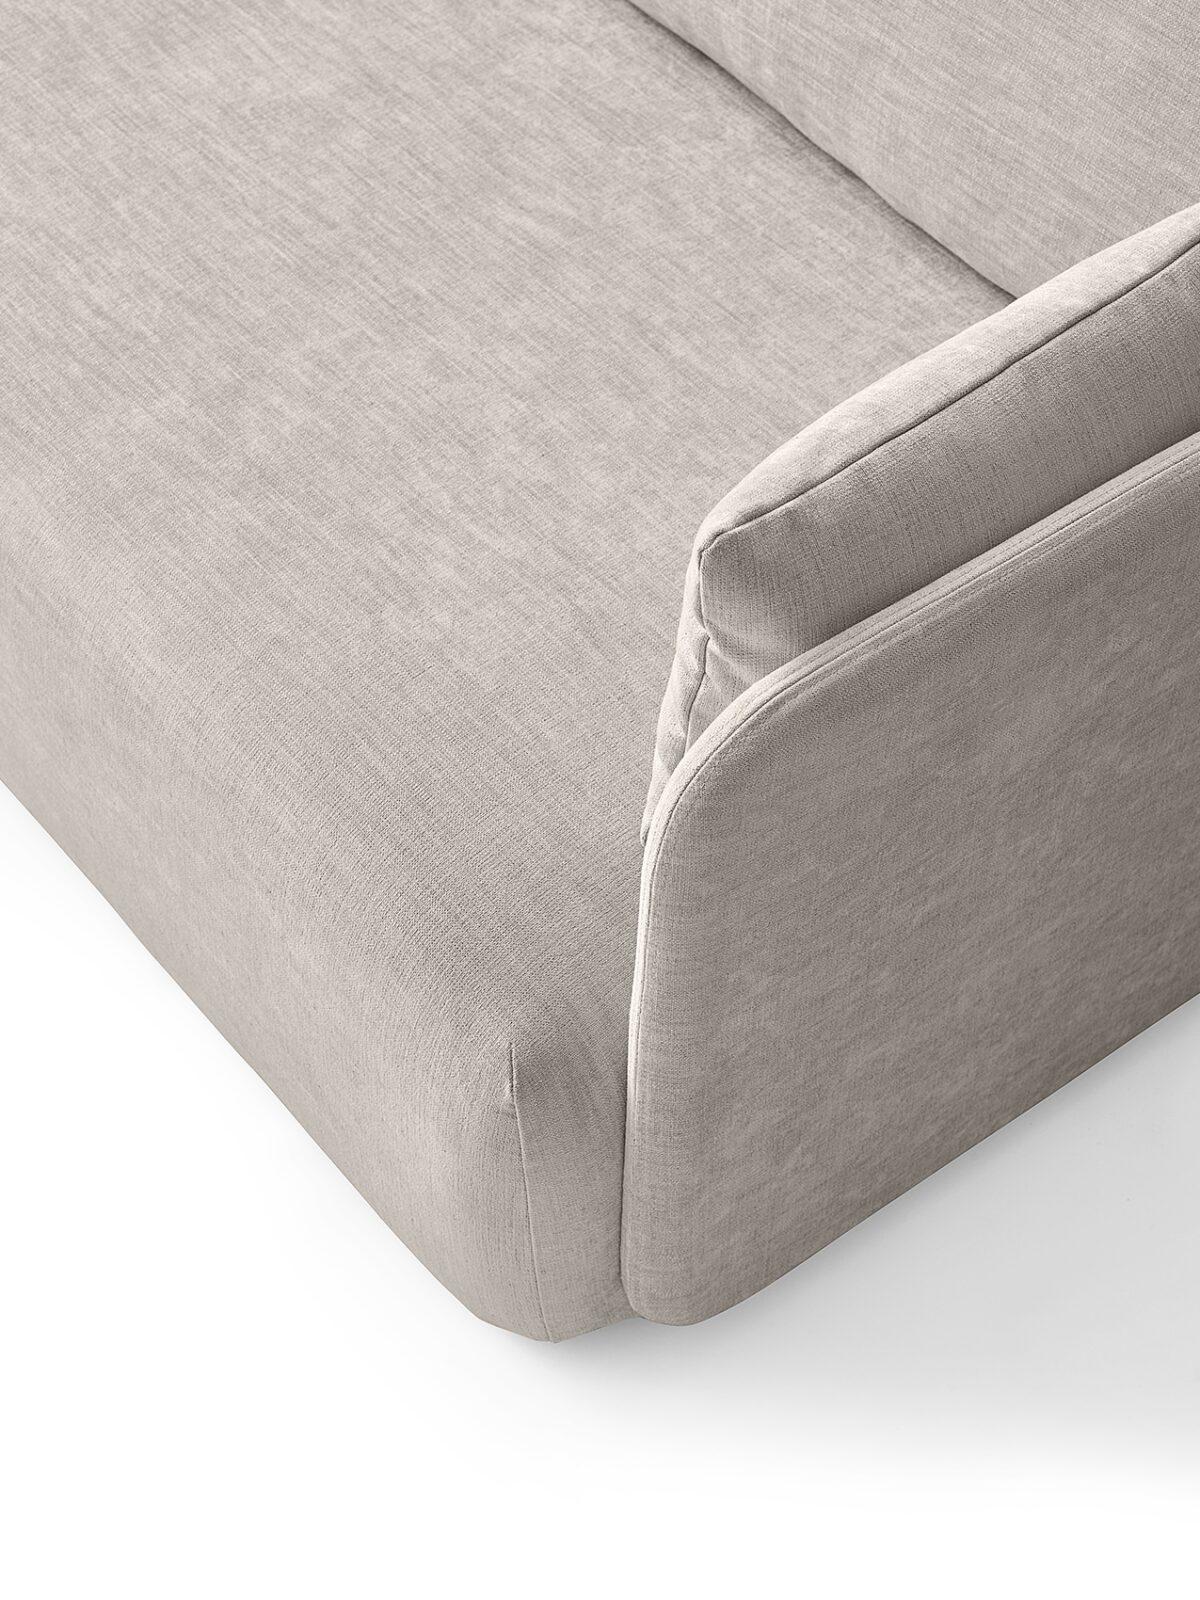 9849069 Offset Sofa 1 Seater Maple 222 detail 22019 06 25 13 56 33 767 1 2